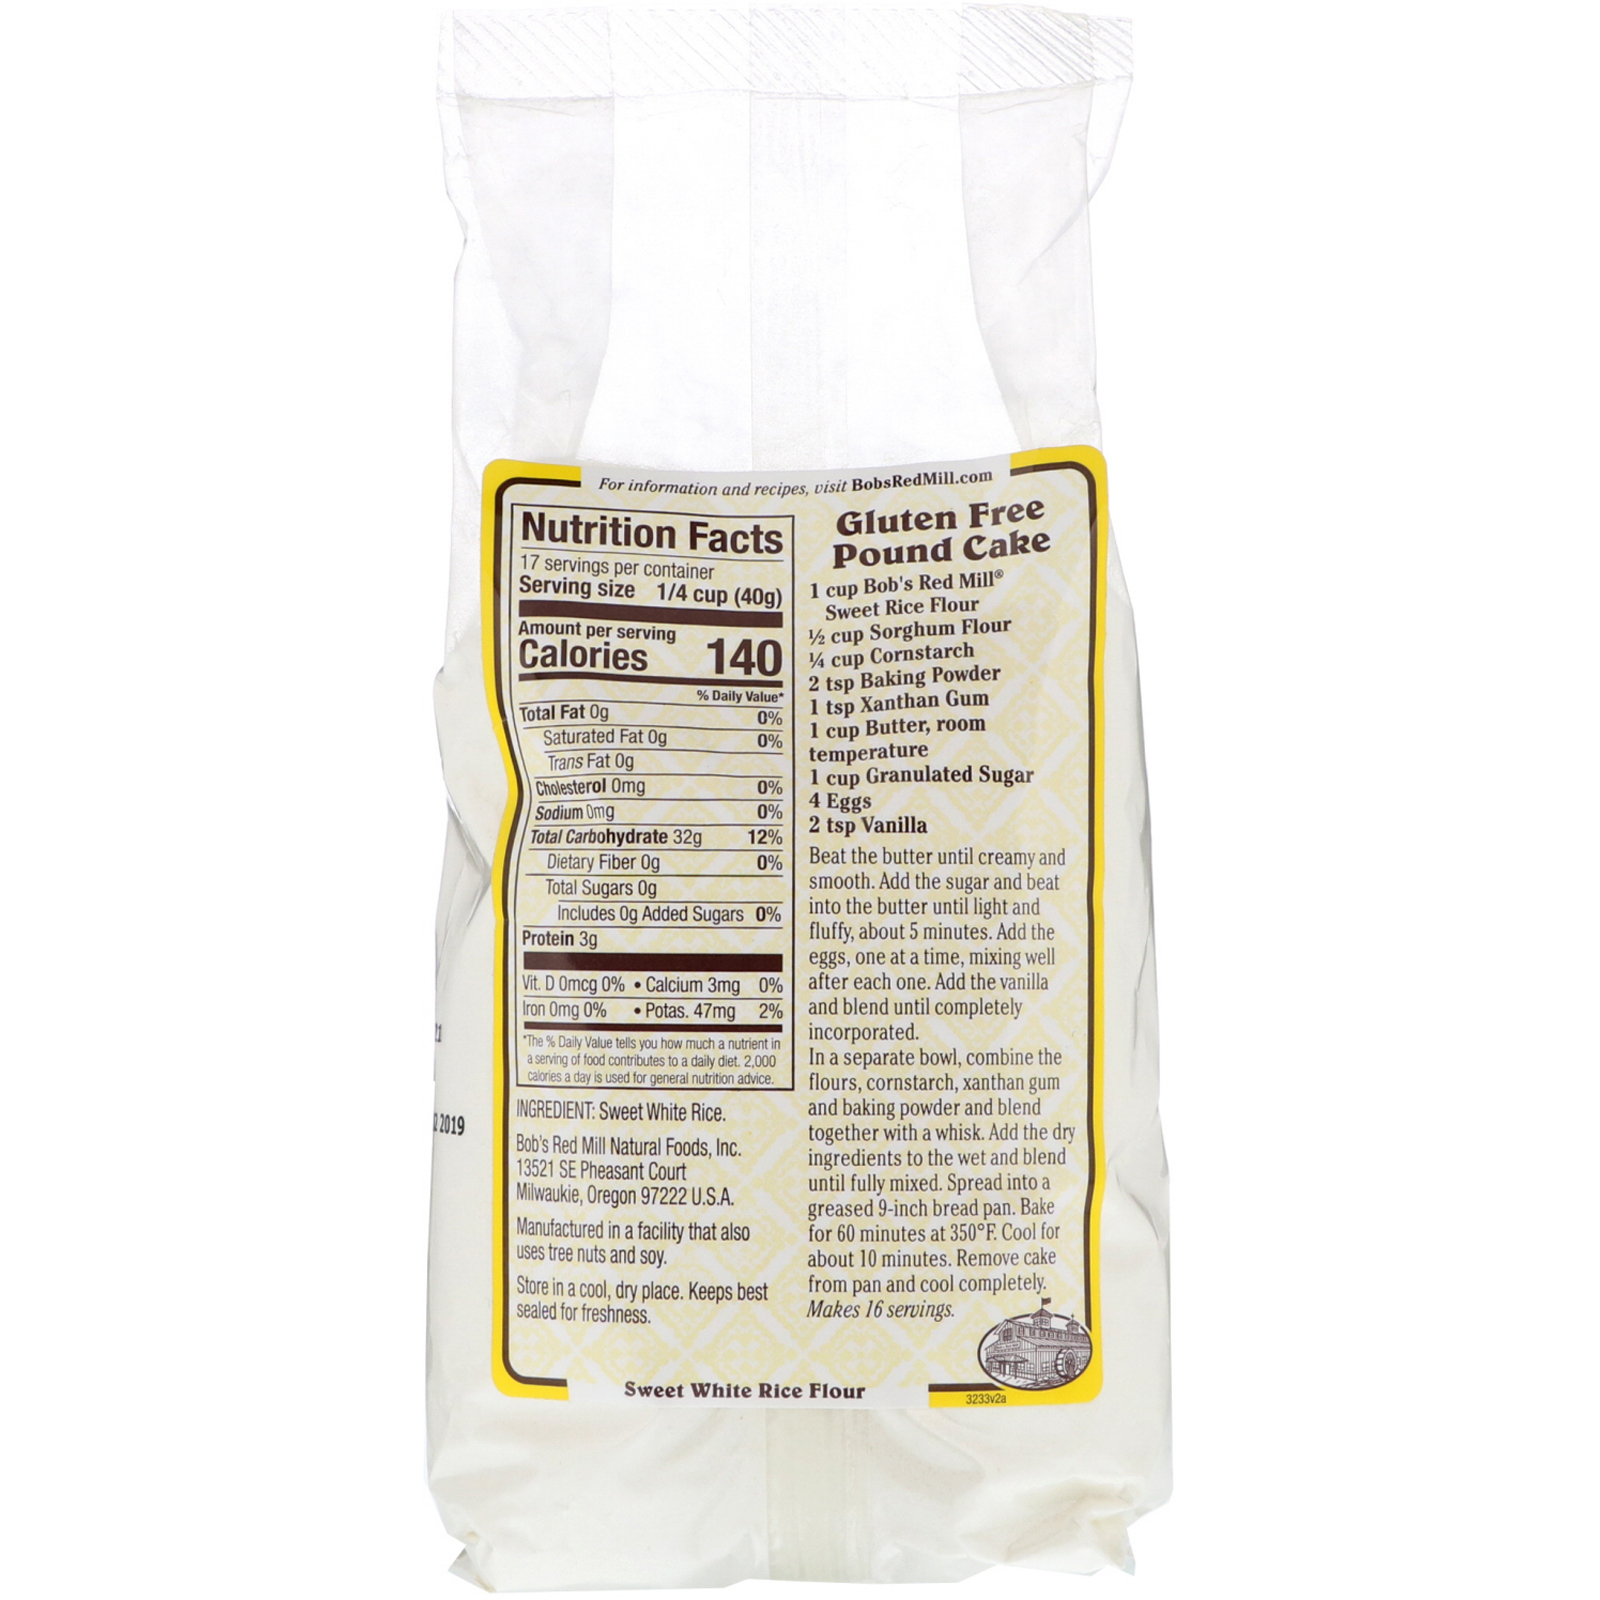 Bob's Red Mill, Sweet White Rice Flour, 24 oz (680 g) - iHerb